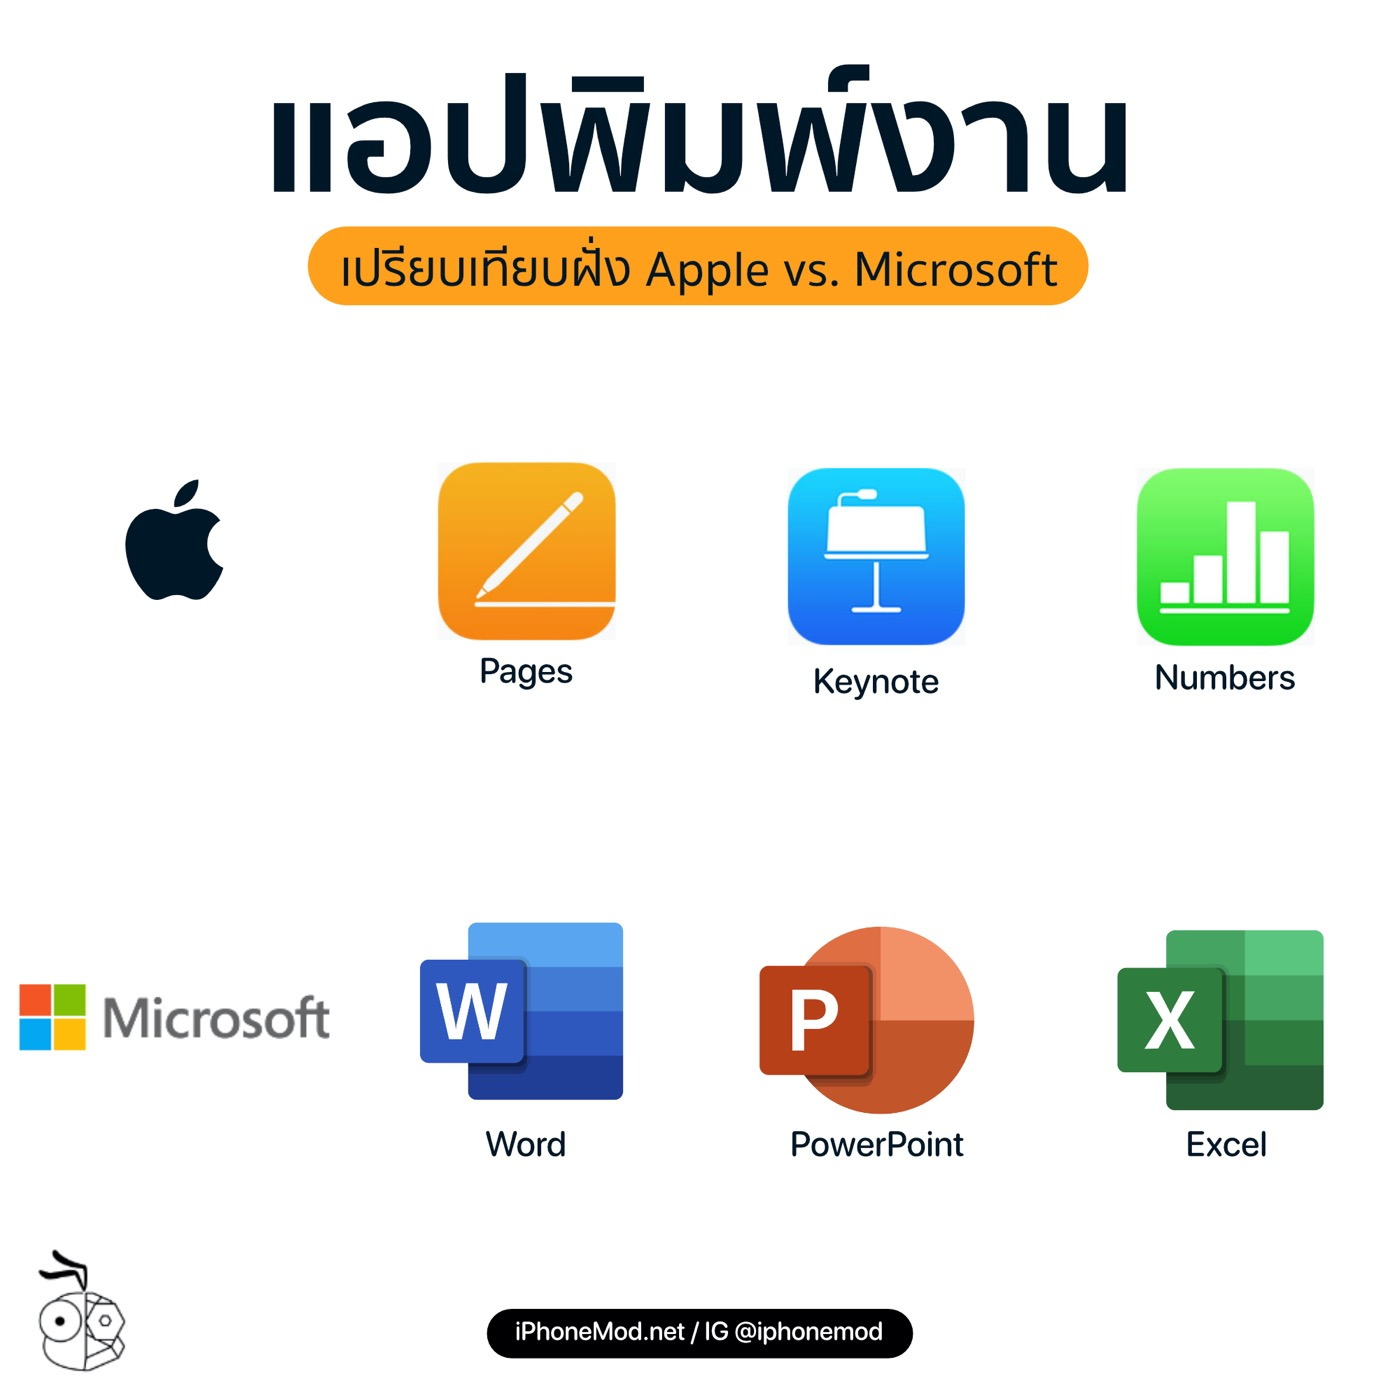 Apple Iwork Vs Ms Offices